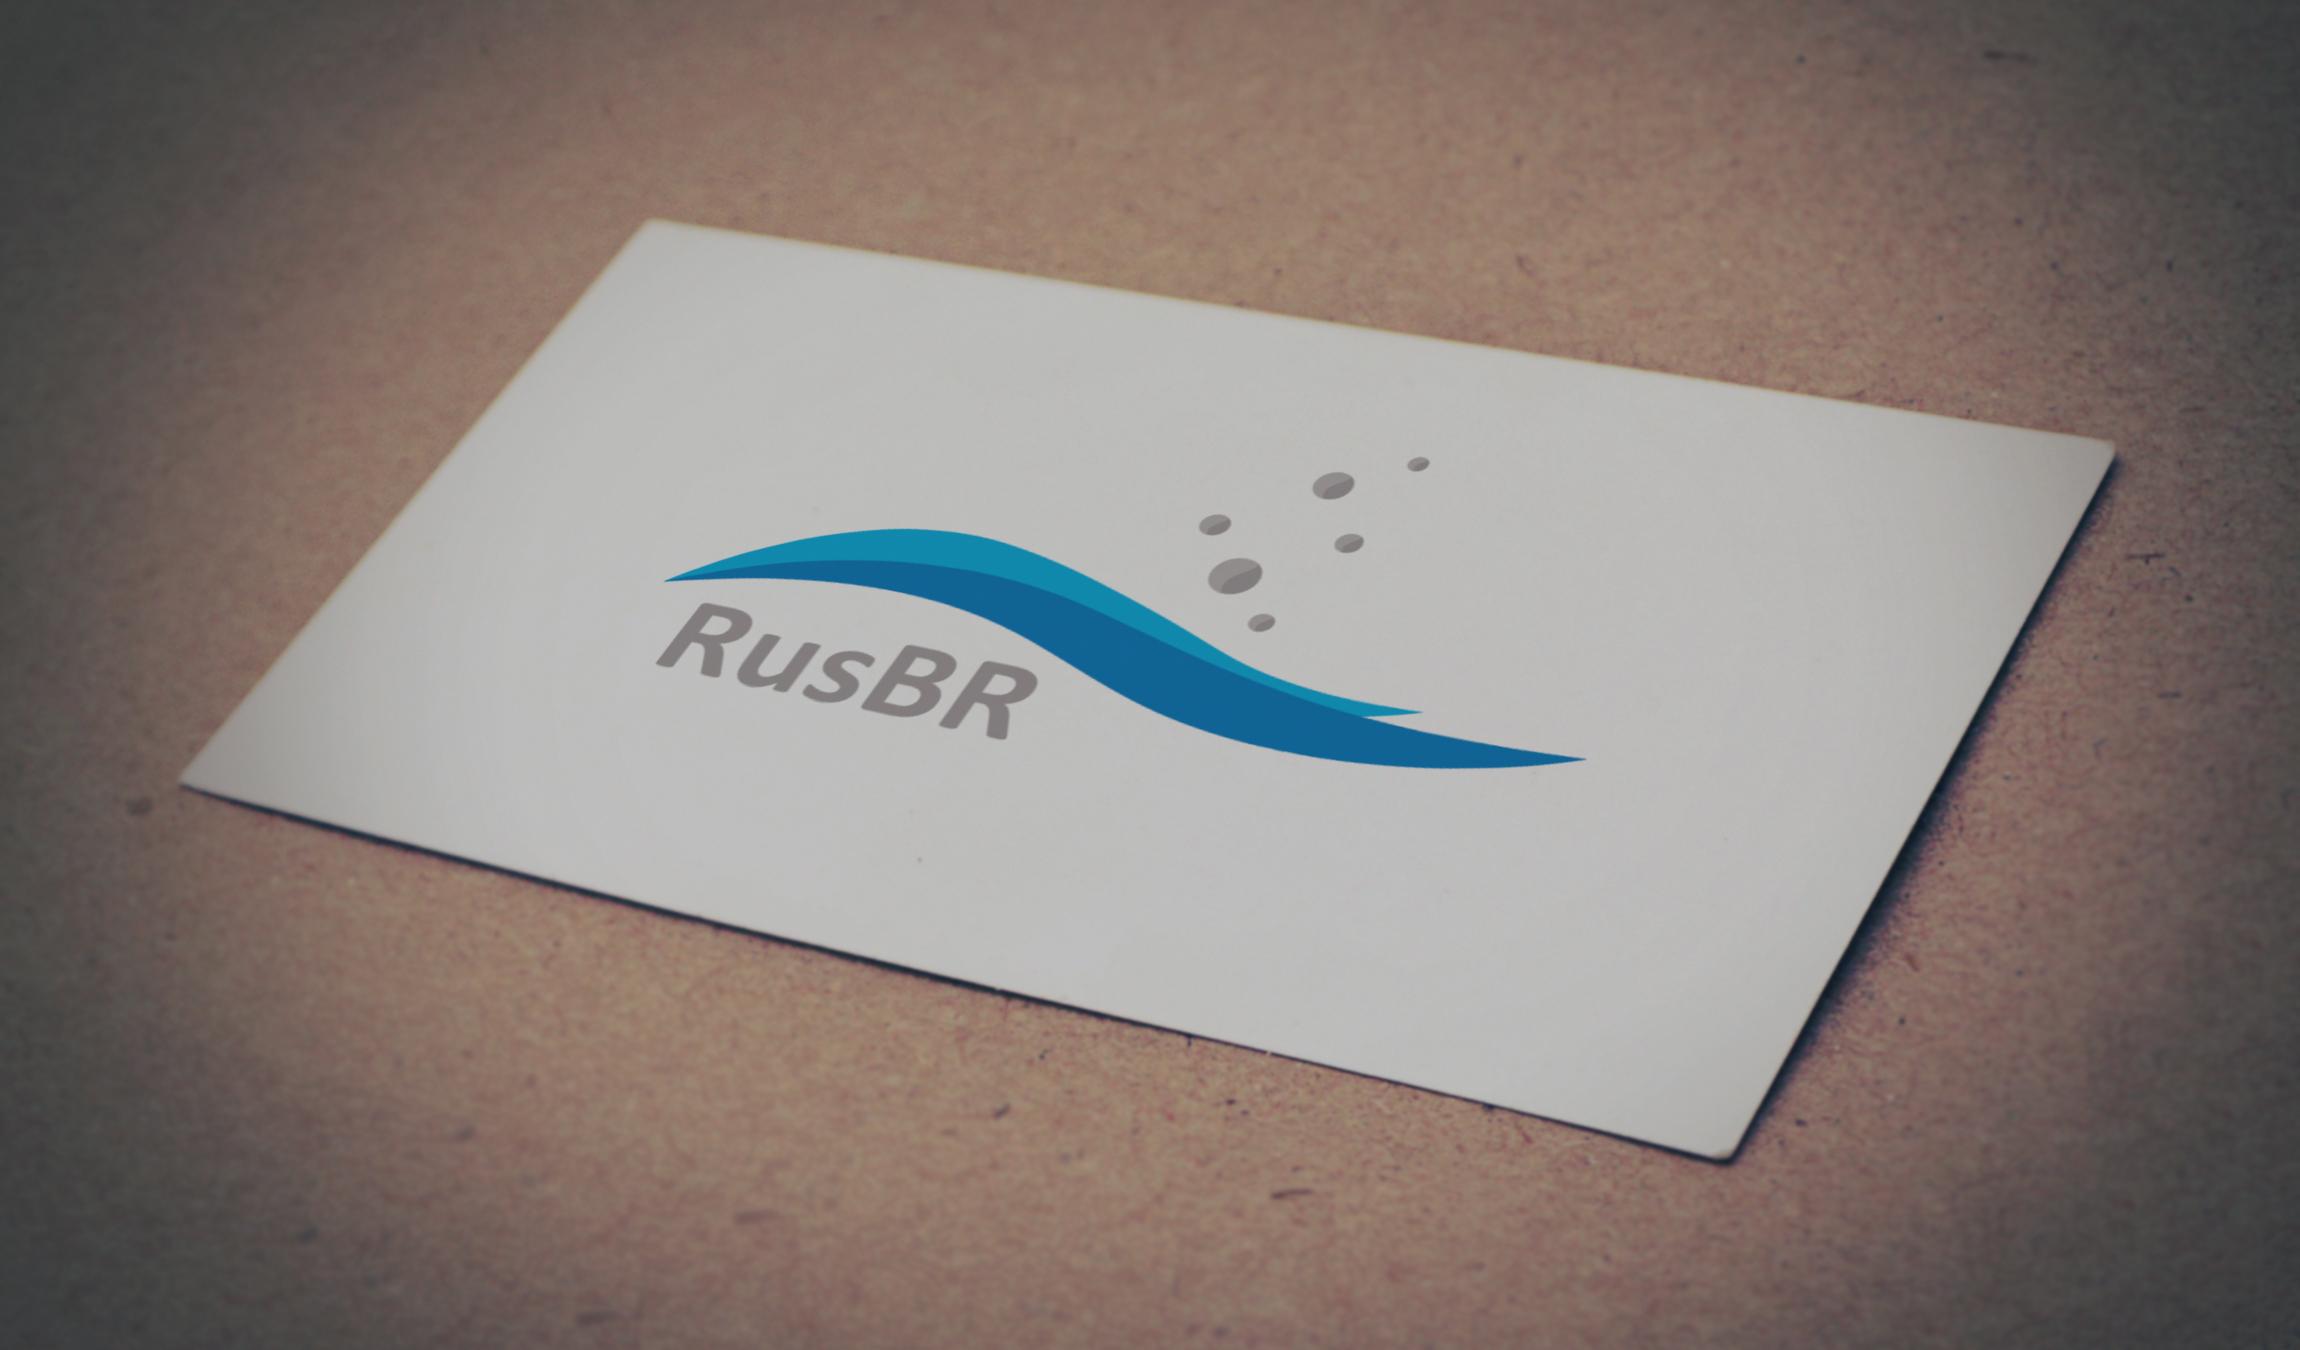 Разработка логотипа для компании «Русские Био Ресурсы» фото f_69258fa48ae50b7d.jpg